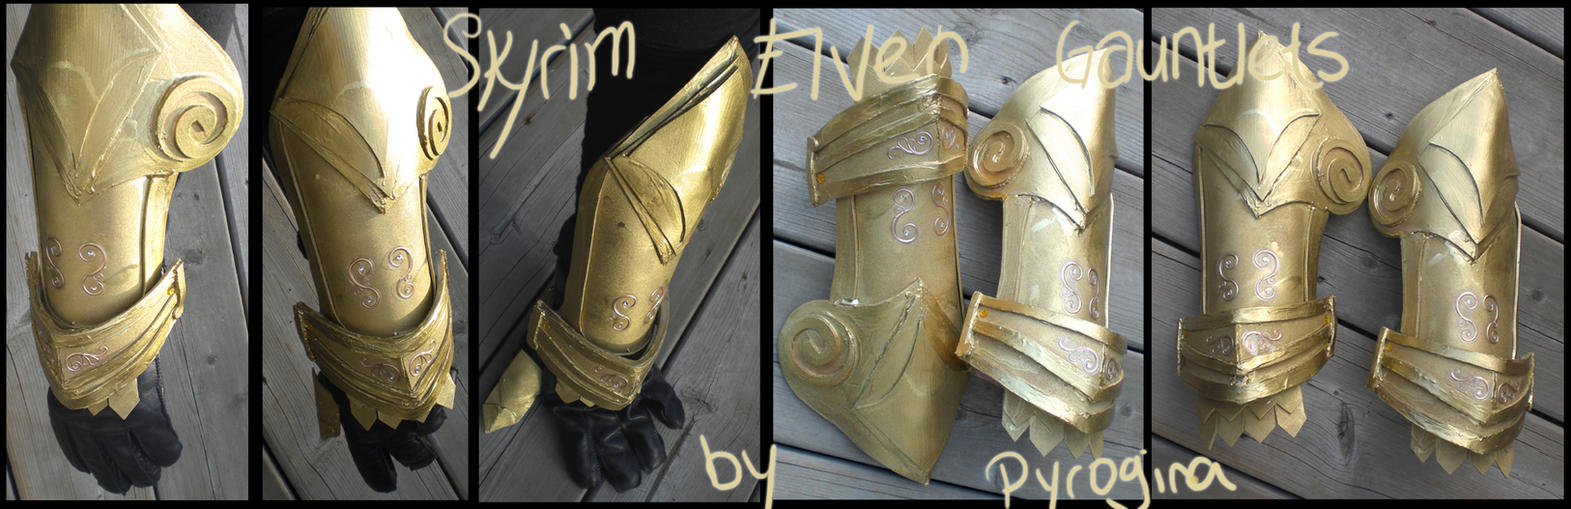 Skyrim - Elven Gauntlets by pyrogina